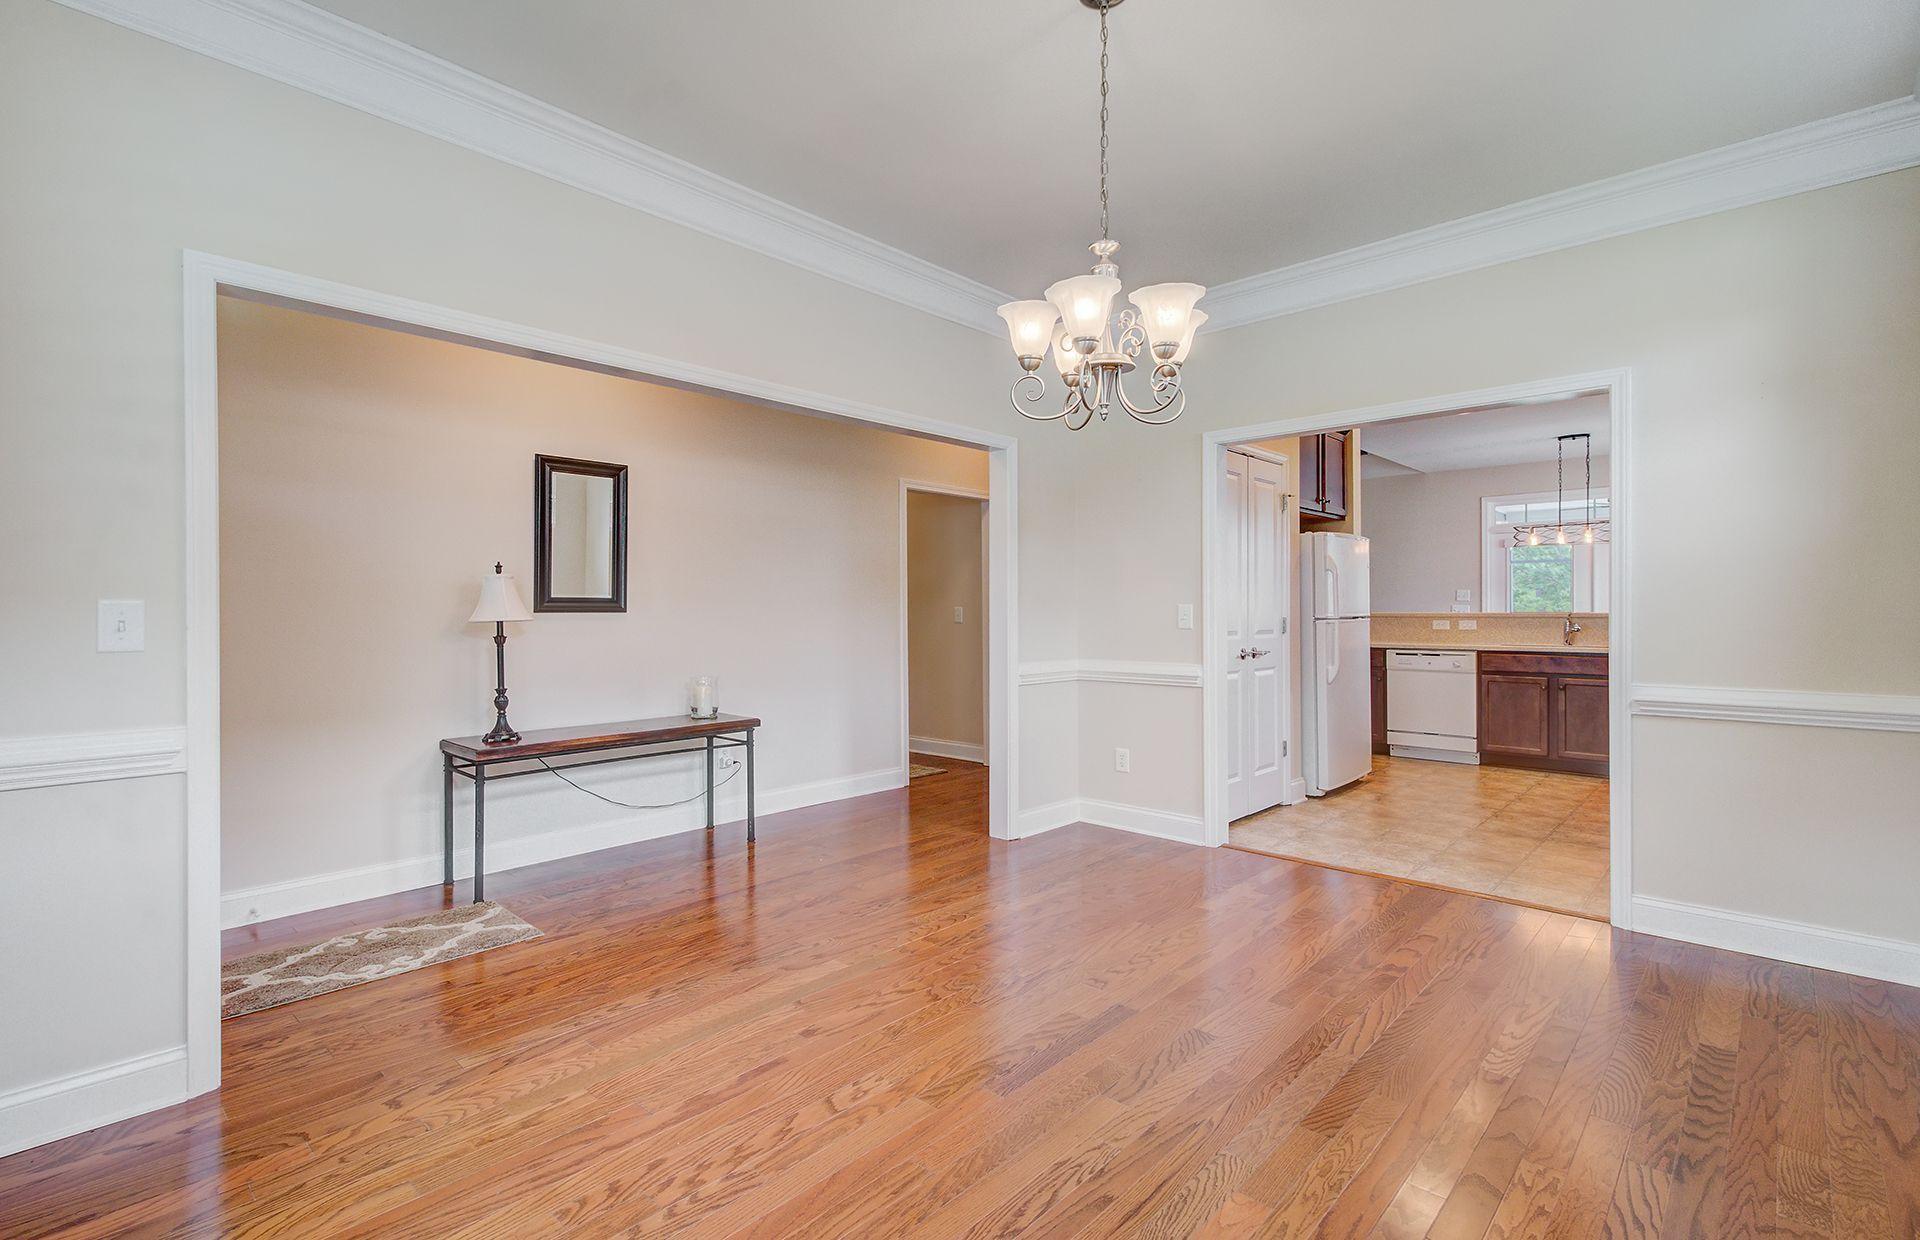 Linnen Place Homes For Sale - 1275 Shingleback, Mount Pleasant, SC - 31